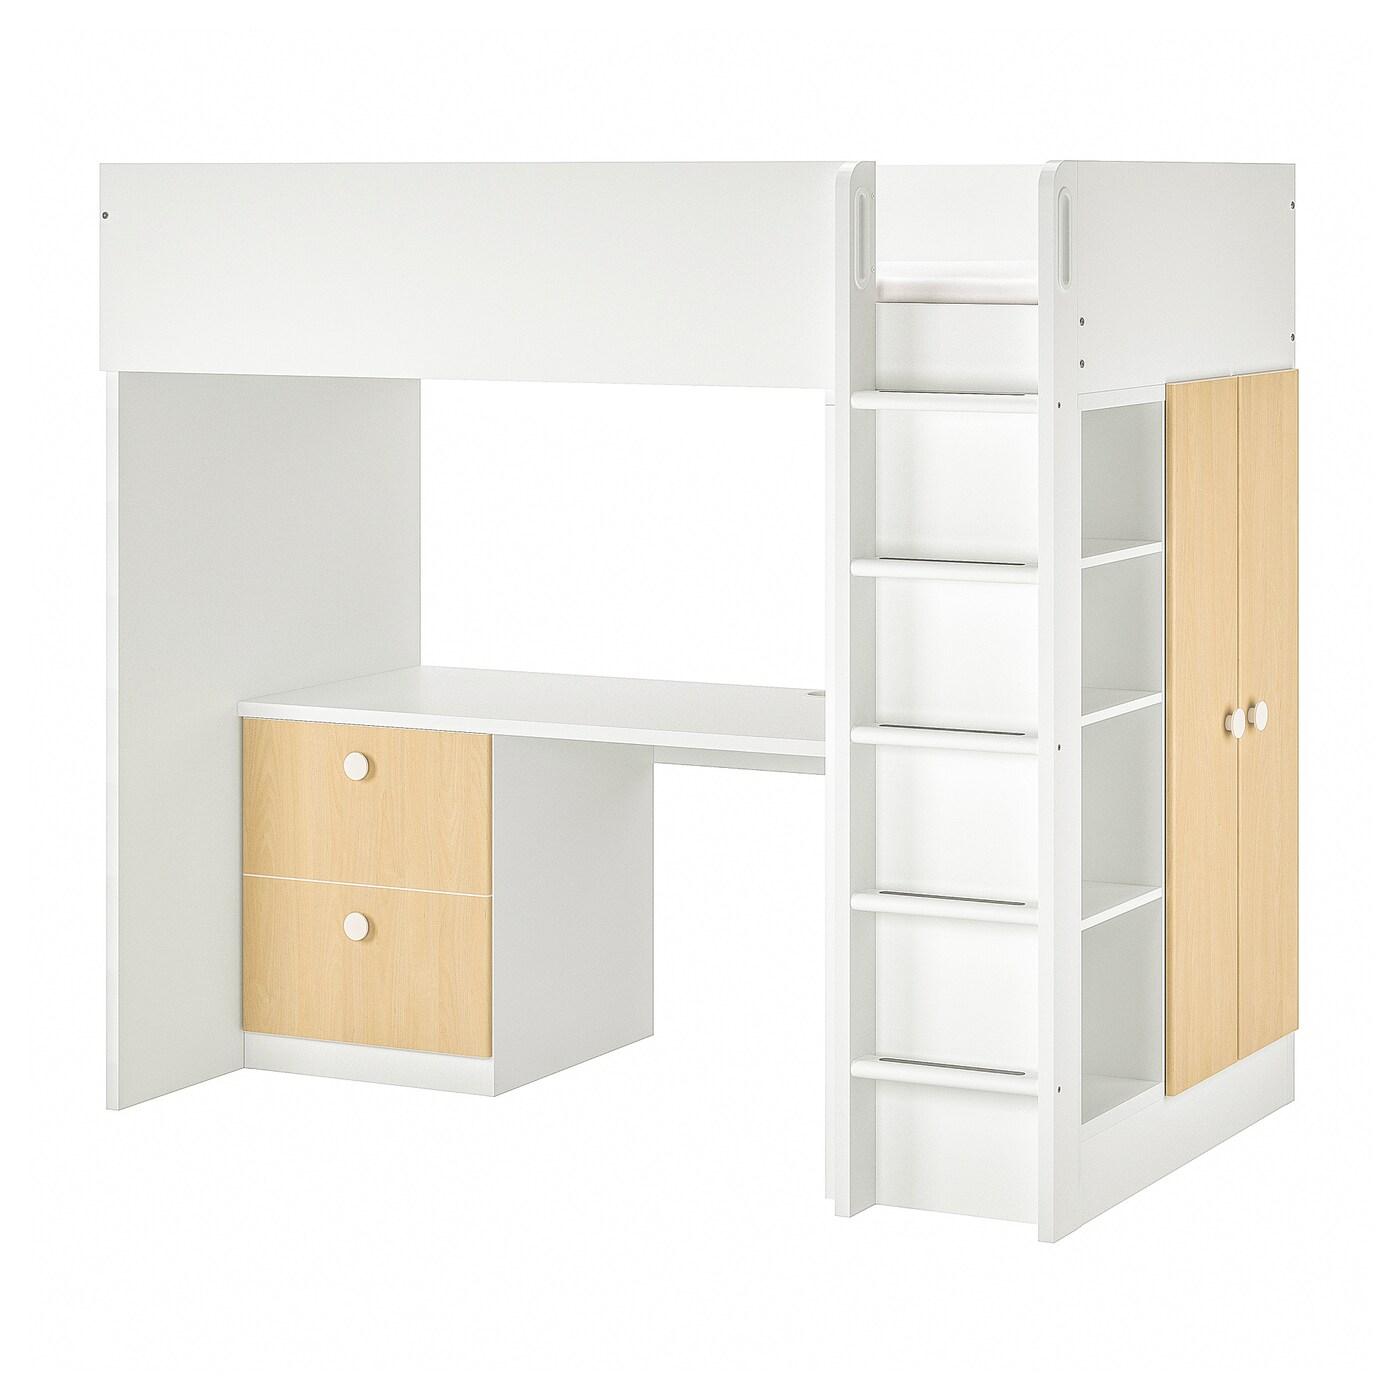 Cama alta + escritorio + armario